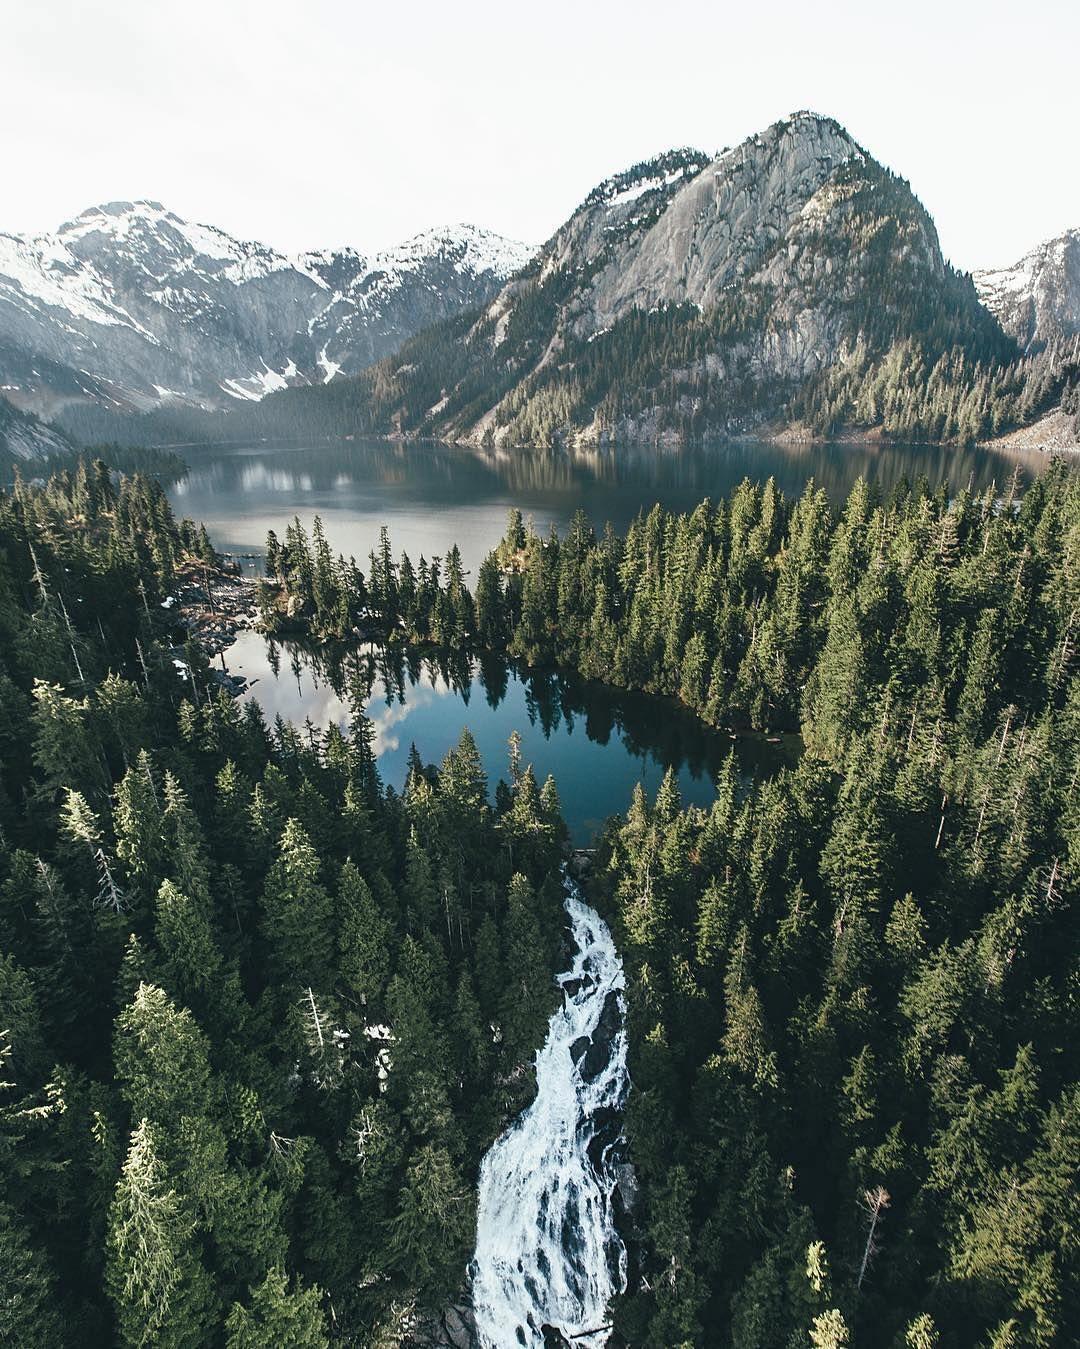 Lakes In Bc Canada: Widgeon Lake Vancouver British Columbia Canada